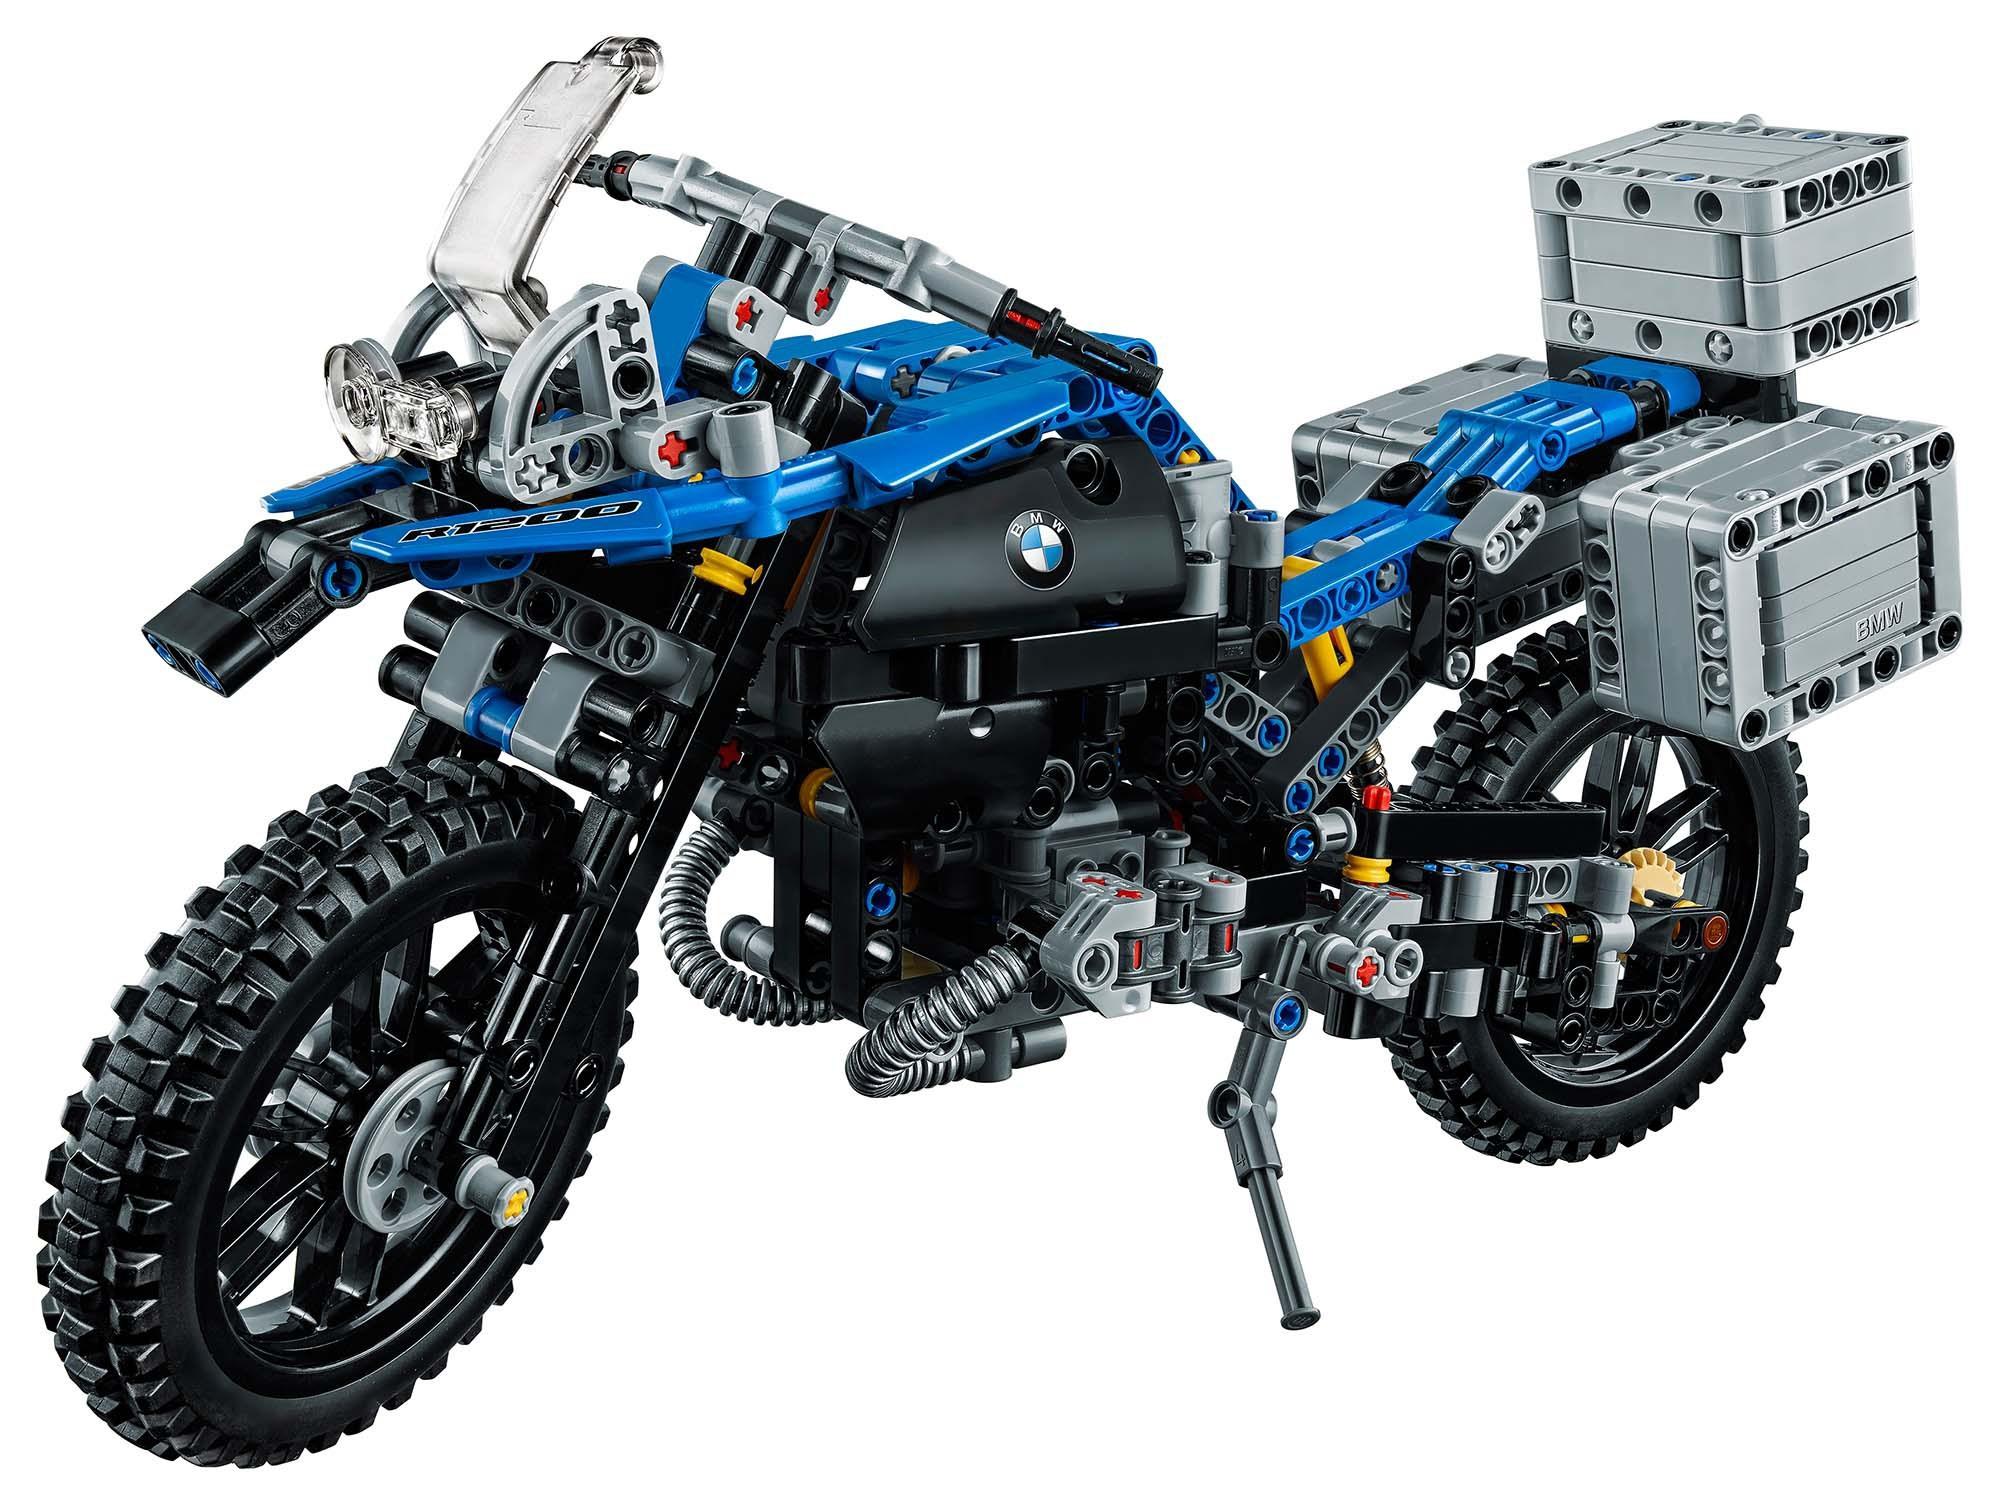 Foto de BMW R 1200 GS Adventure LEGO (10/13)